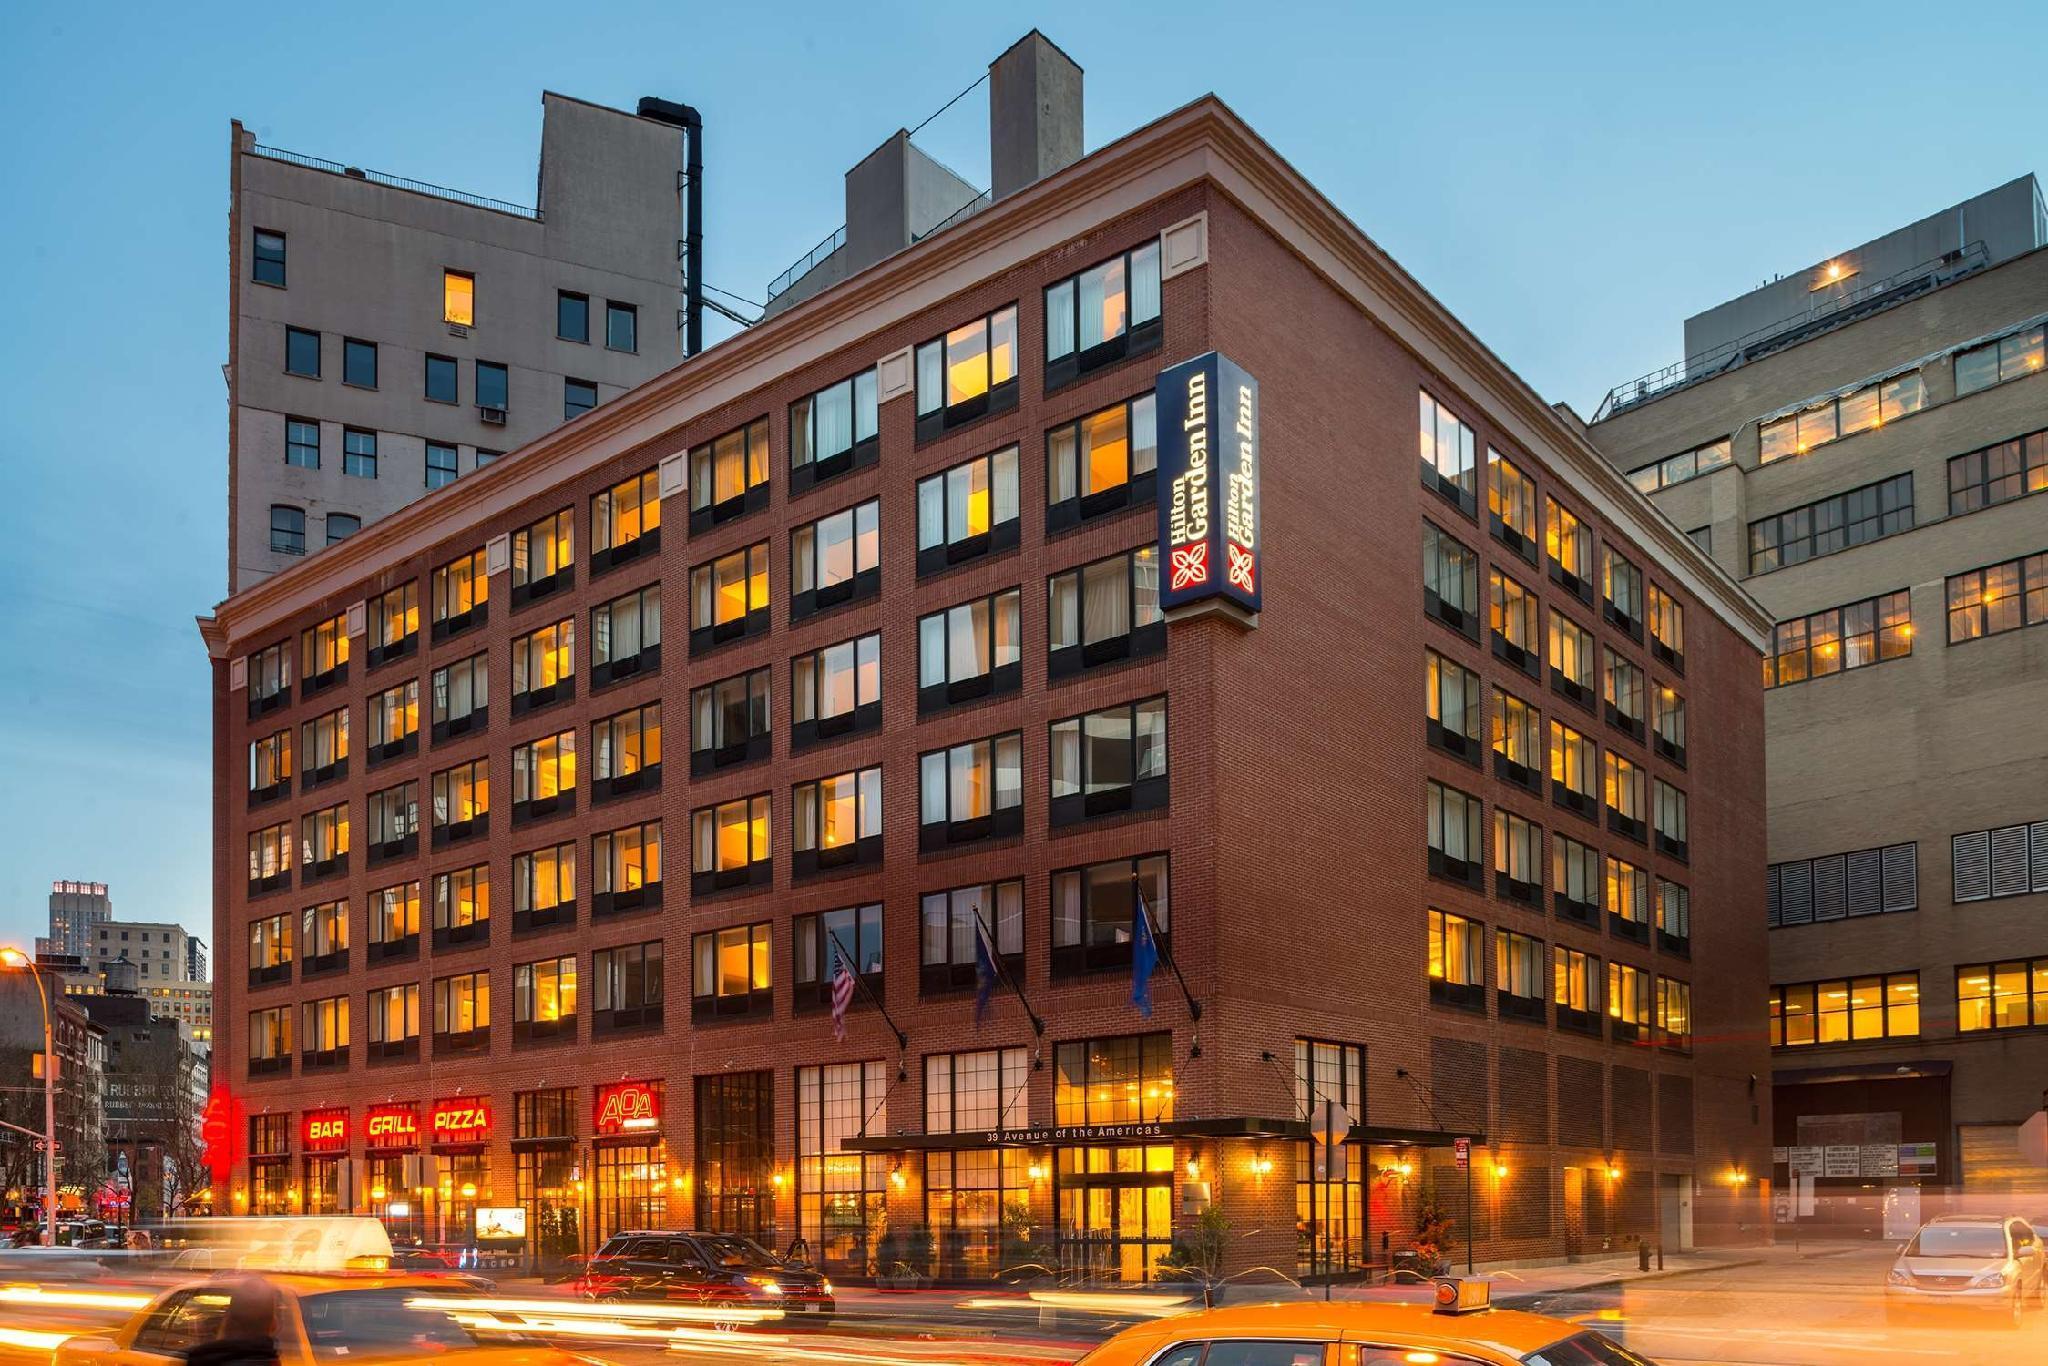 Hilton Garden Inn New York City Tribeca